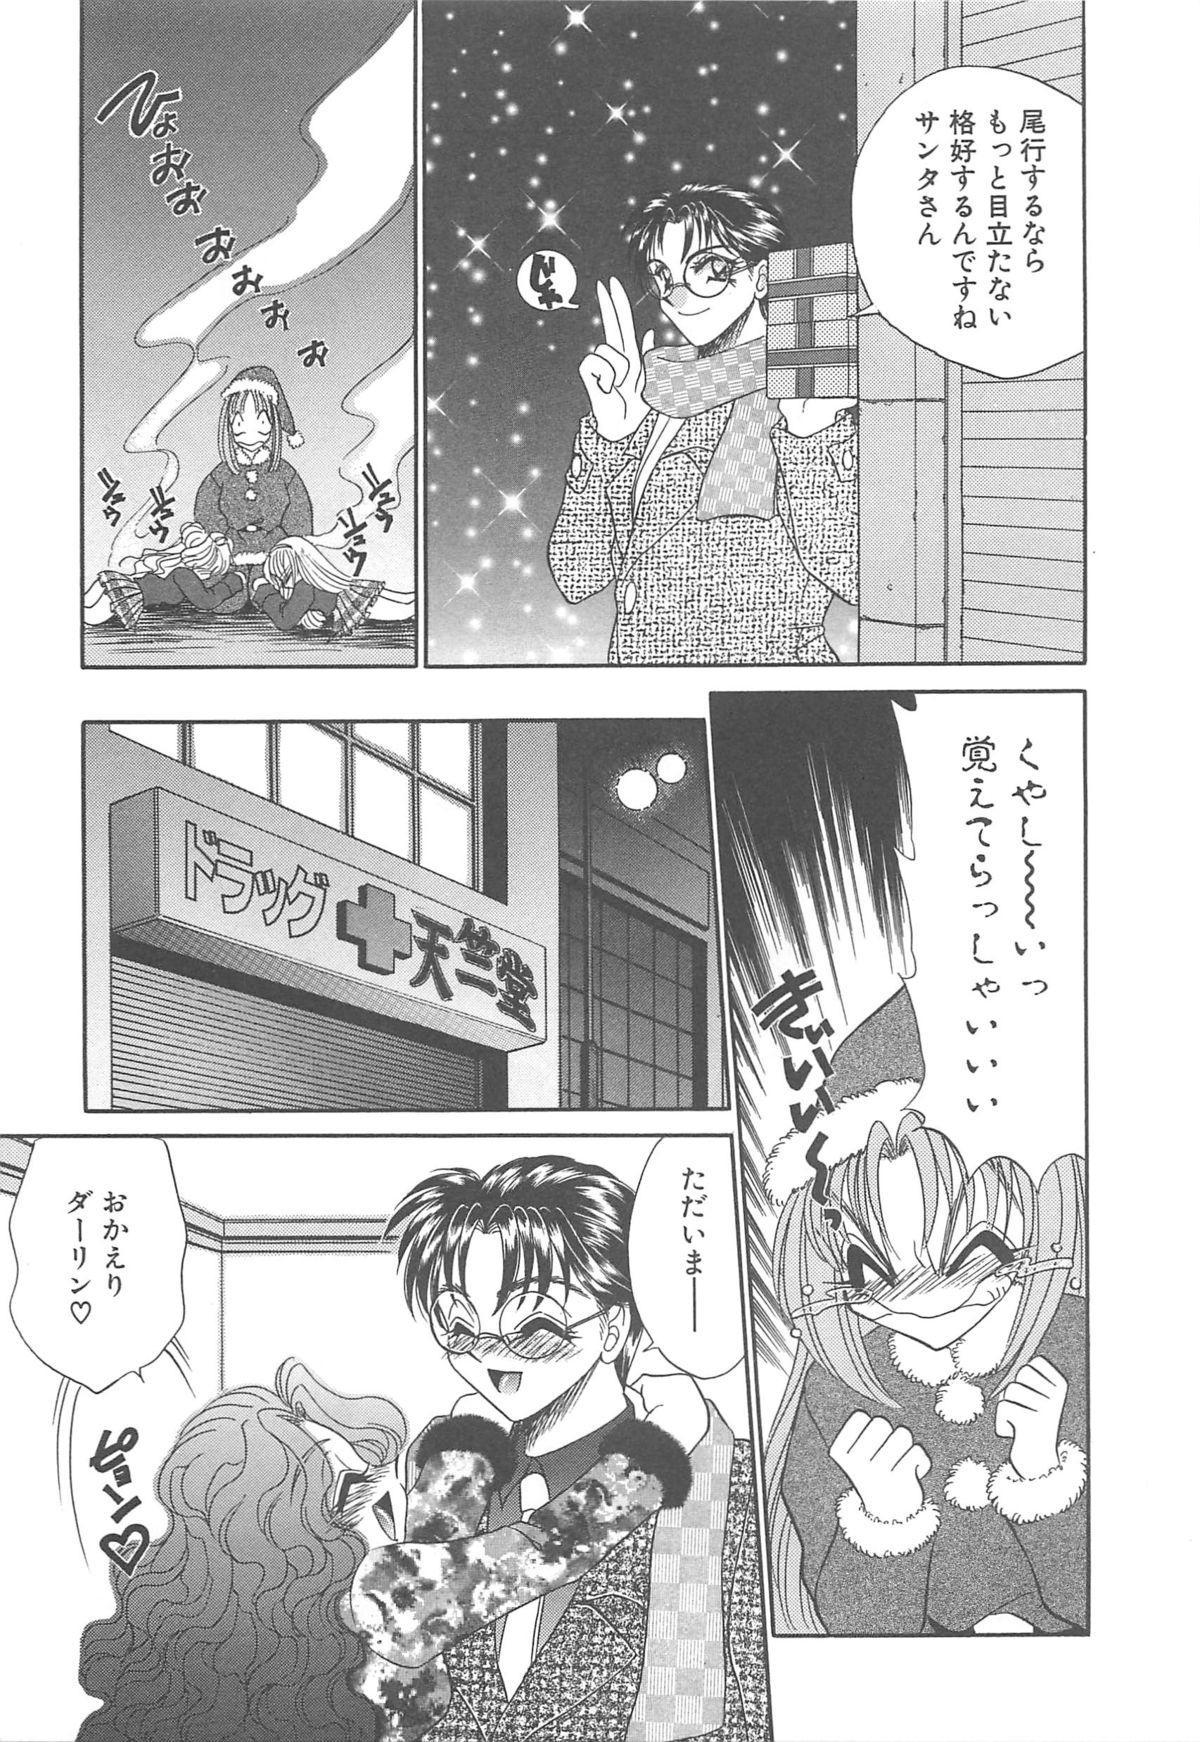 Kigurumi Sentai Quiltian 97